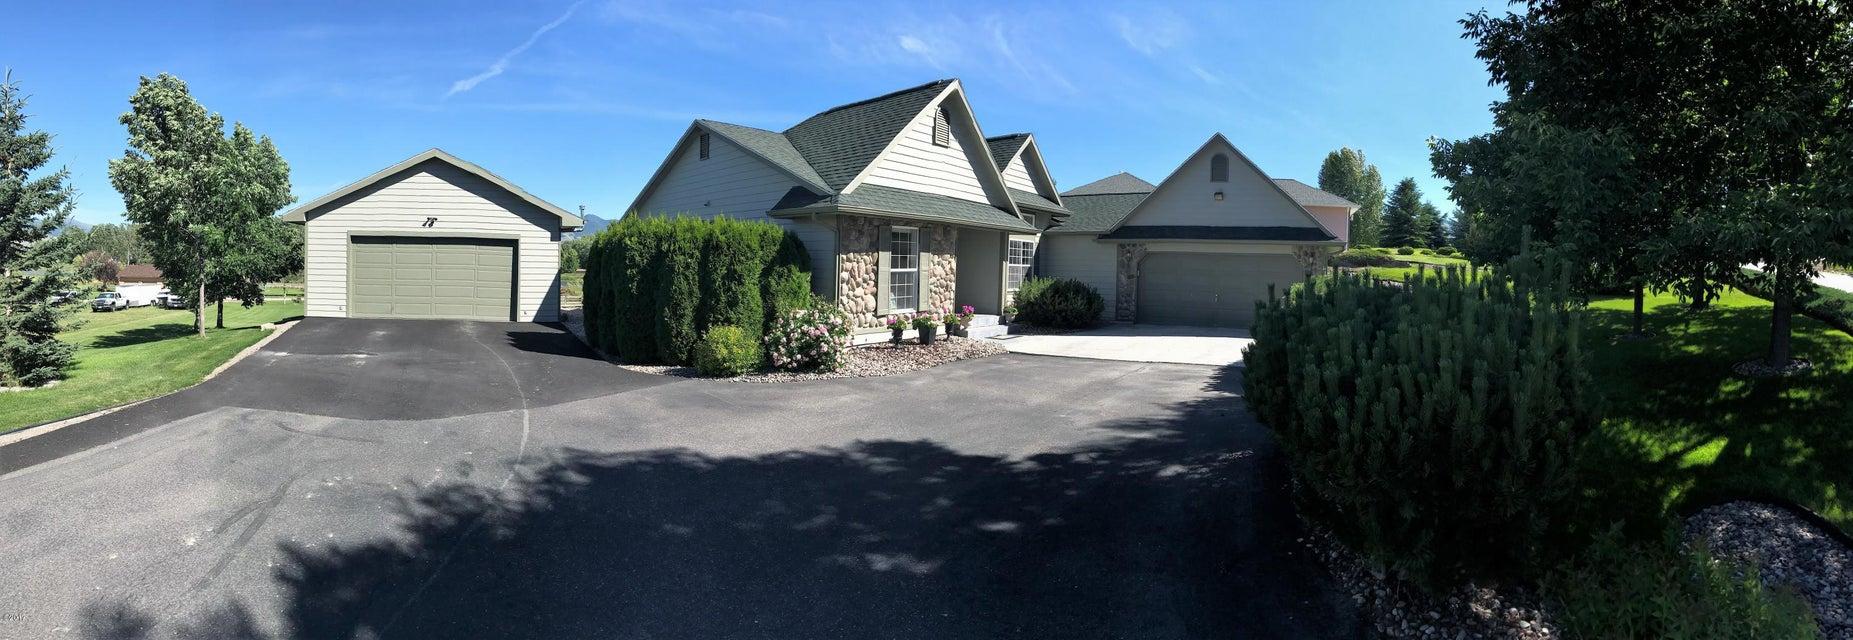 2781 Grassland Drive, Missoula, MT 59808